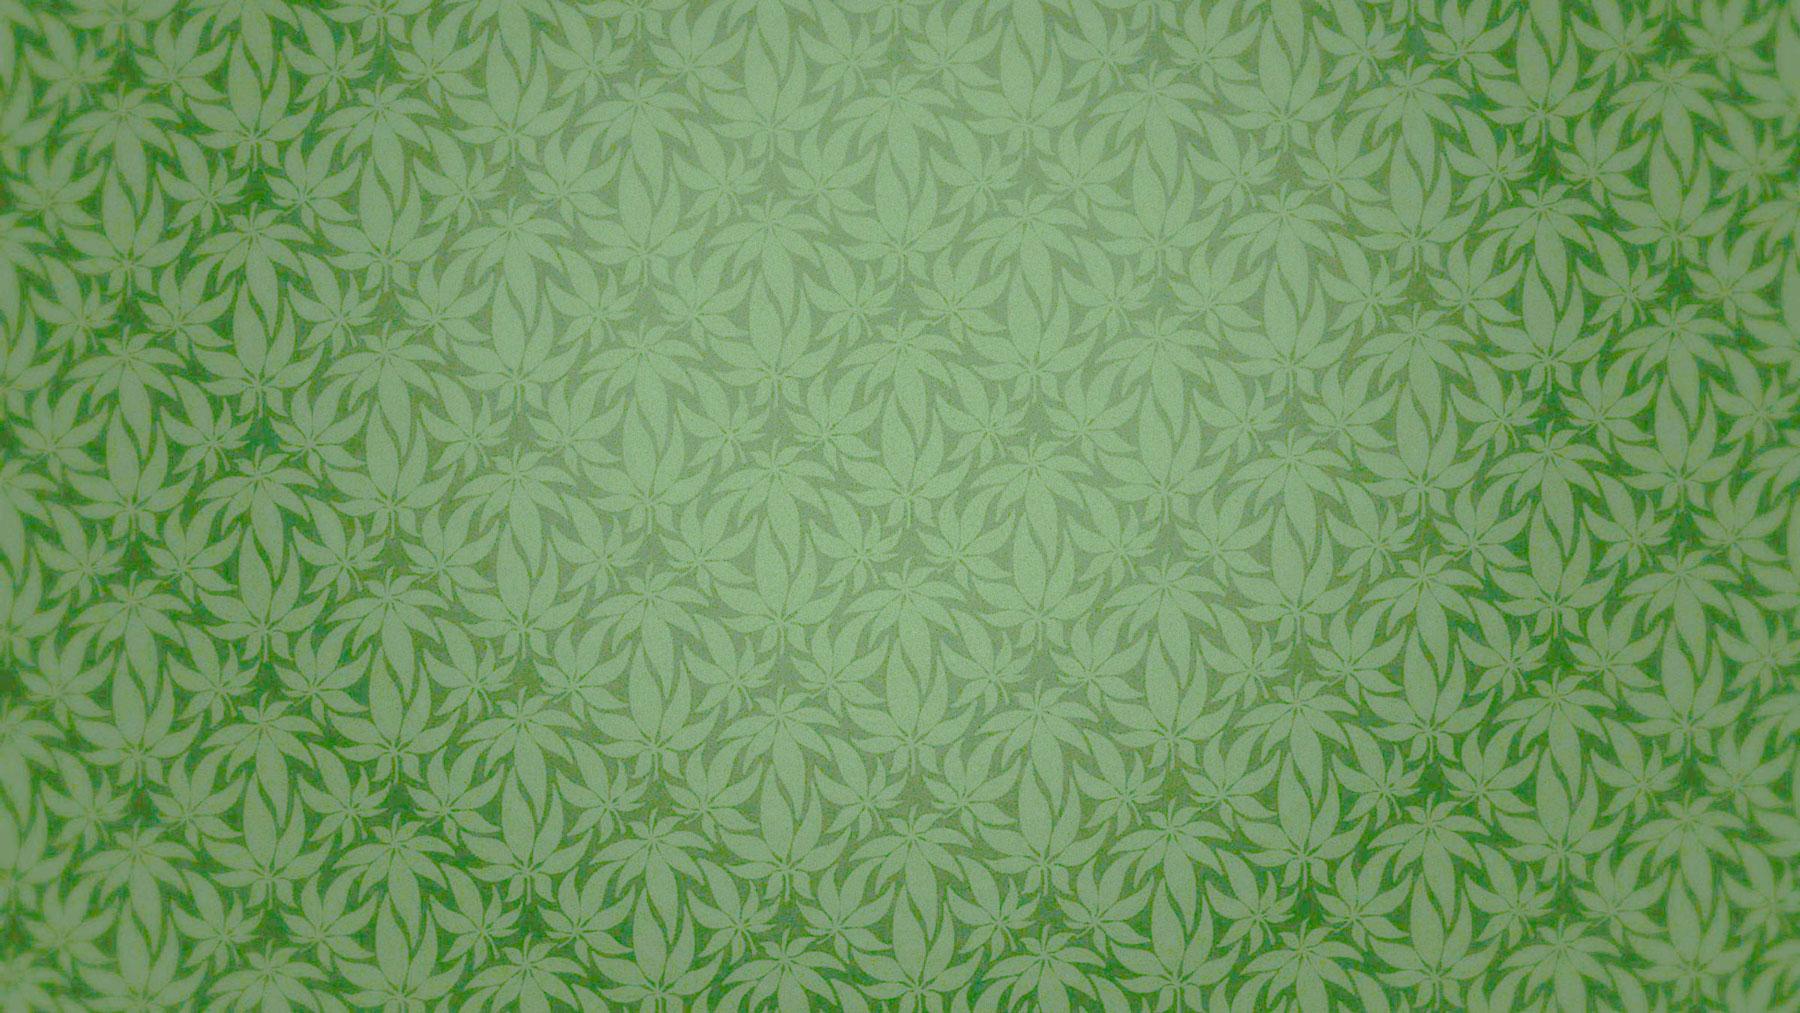 bg-green-marijuana-light-1800x1013